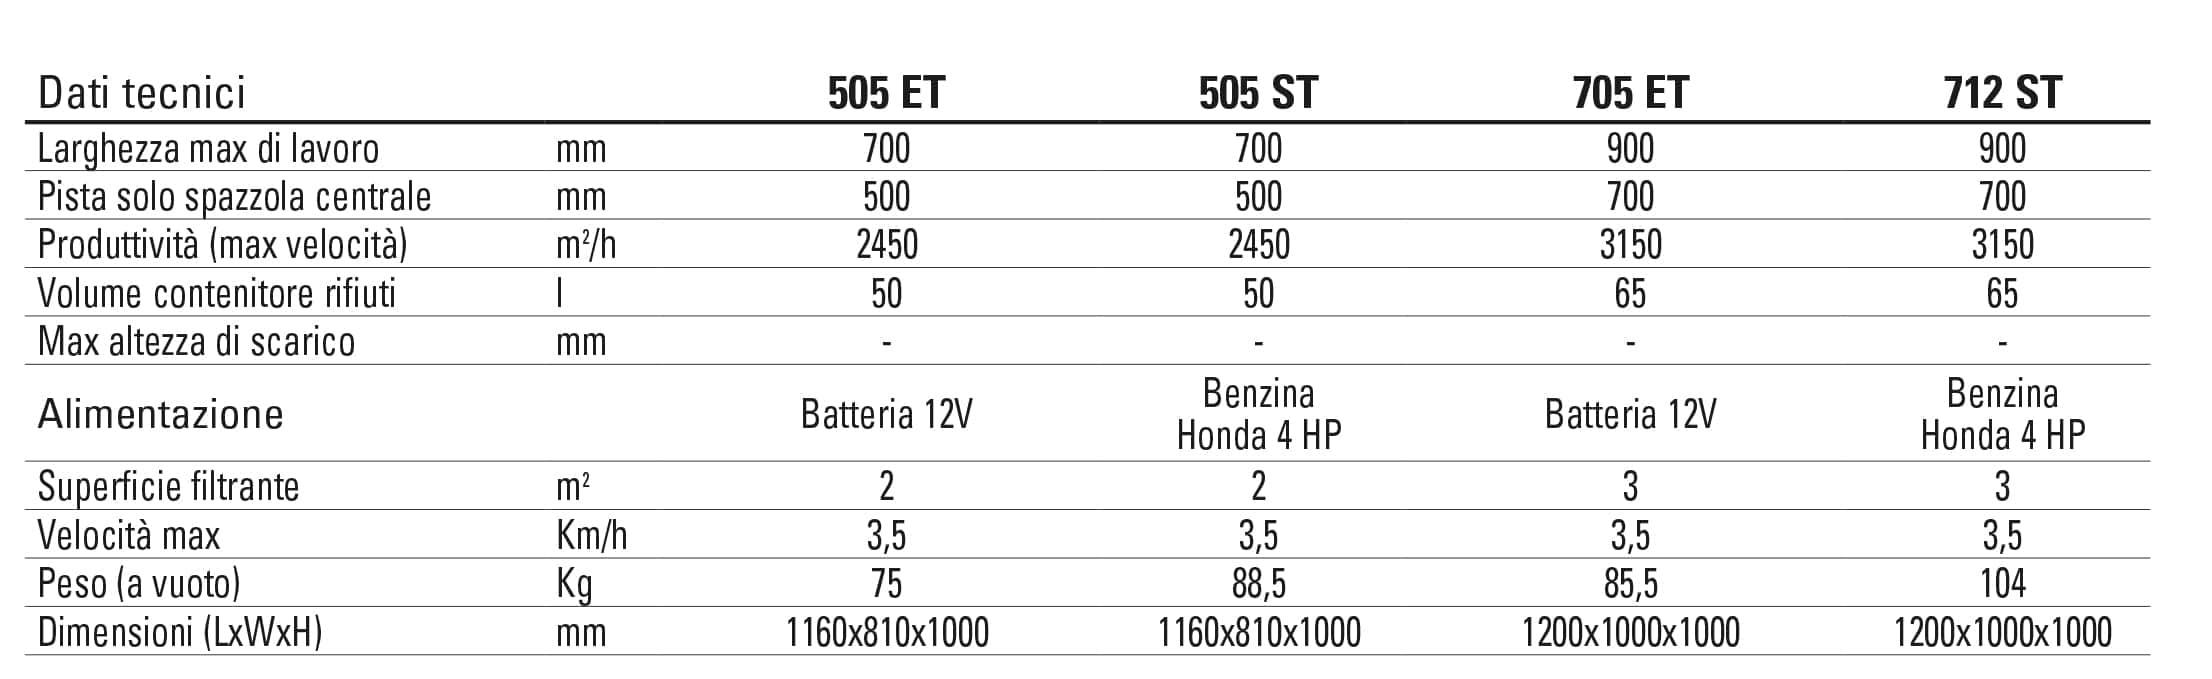 dati tecnici 505-705